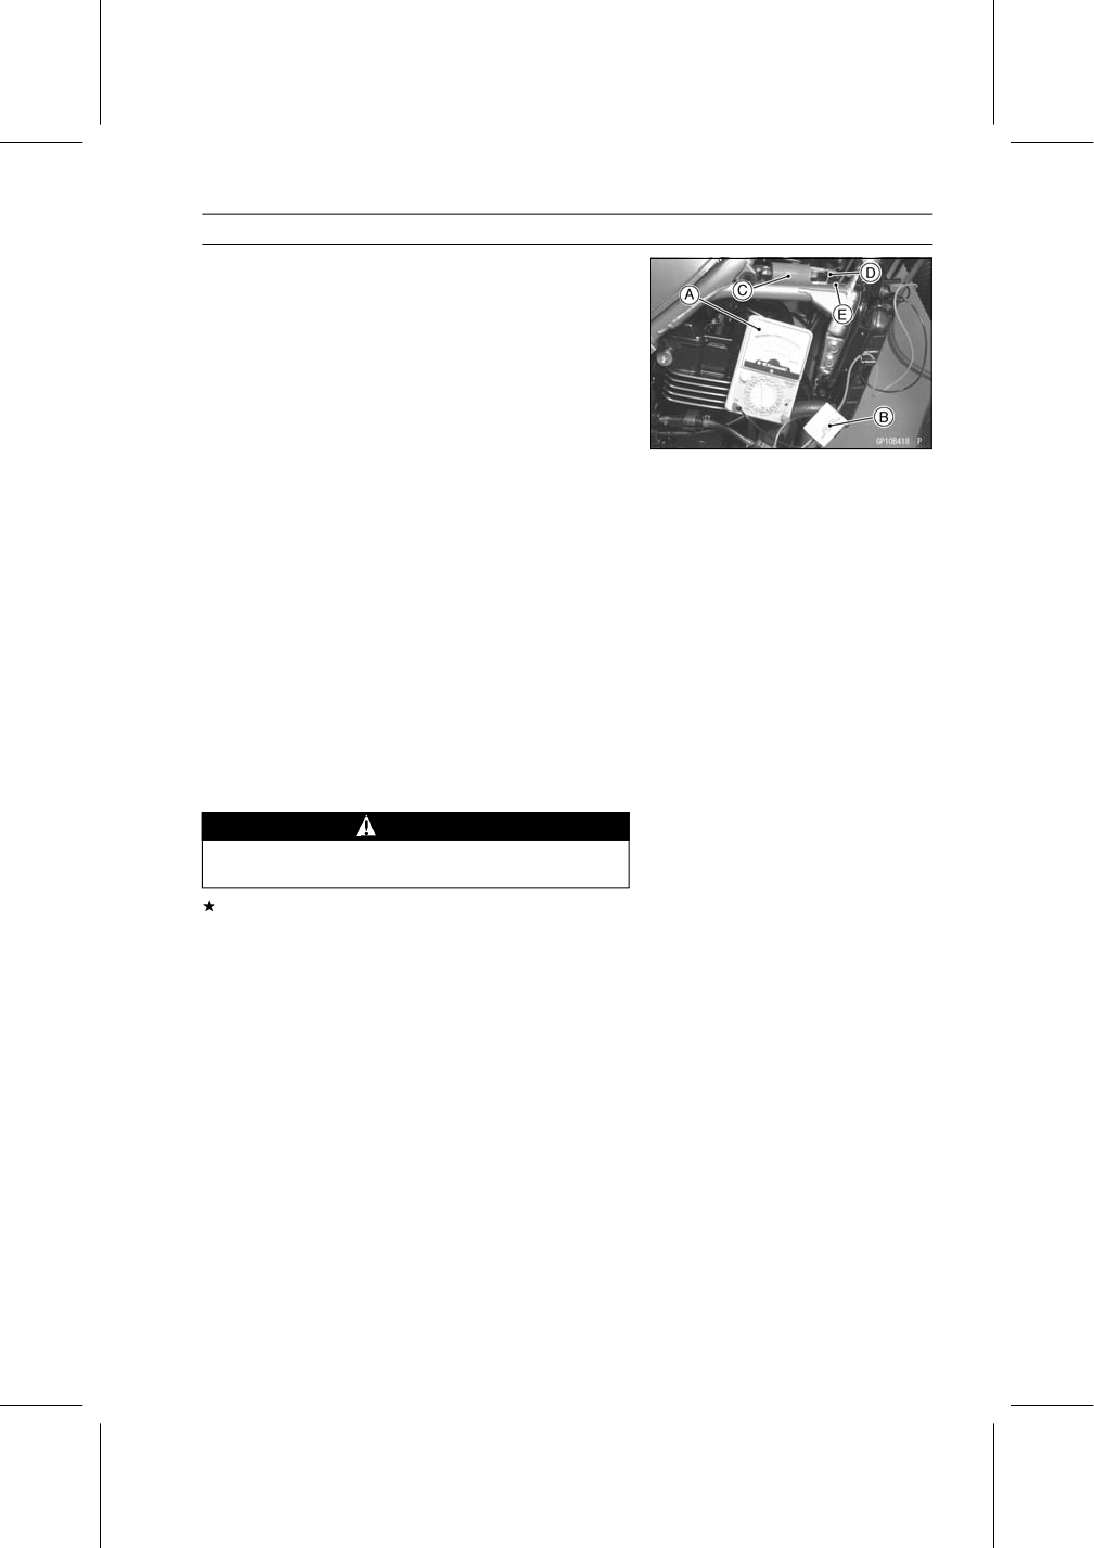 Инструкцию Kawasaki Kle 250